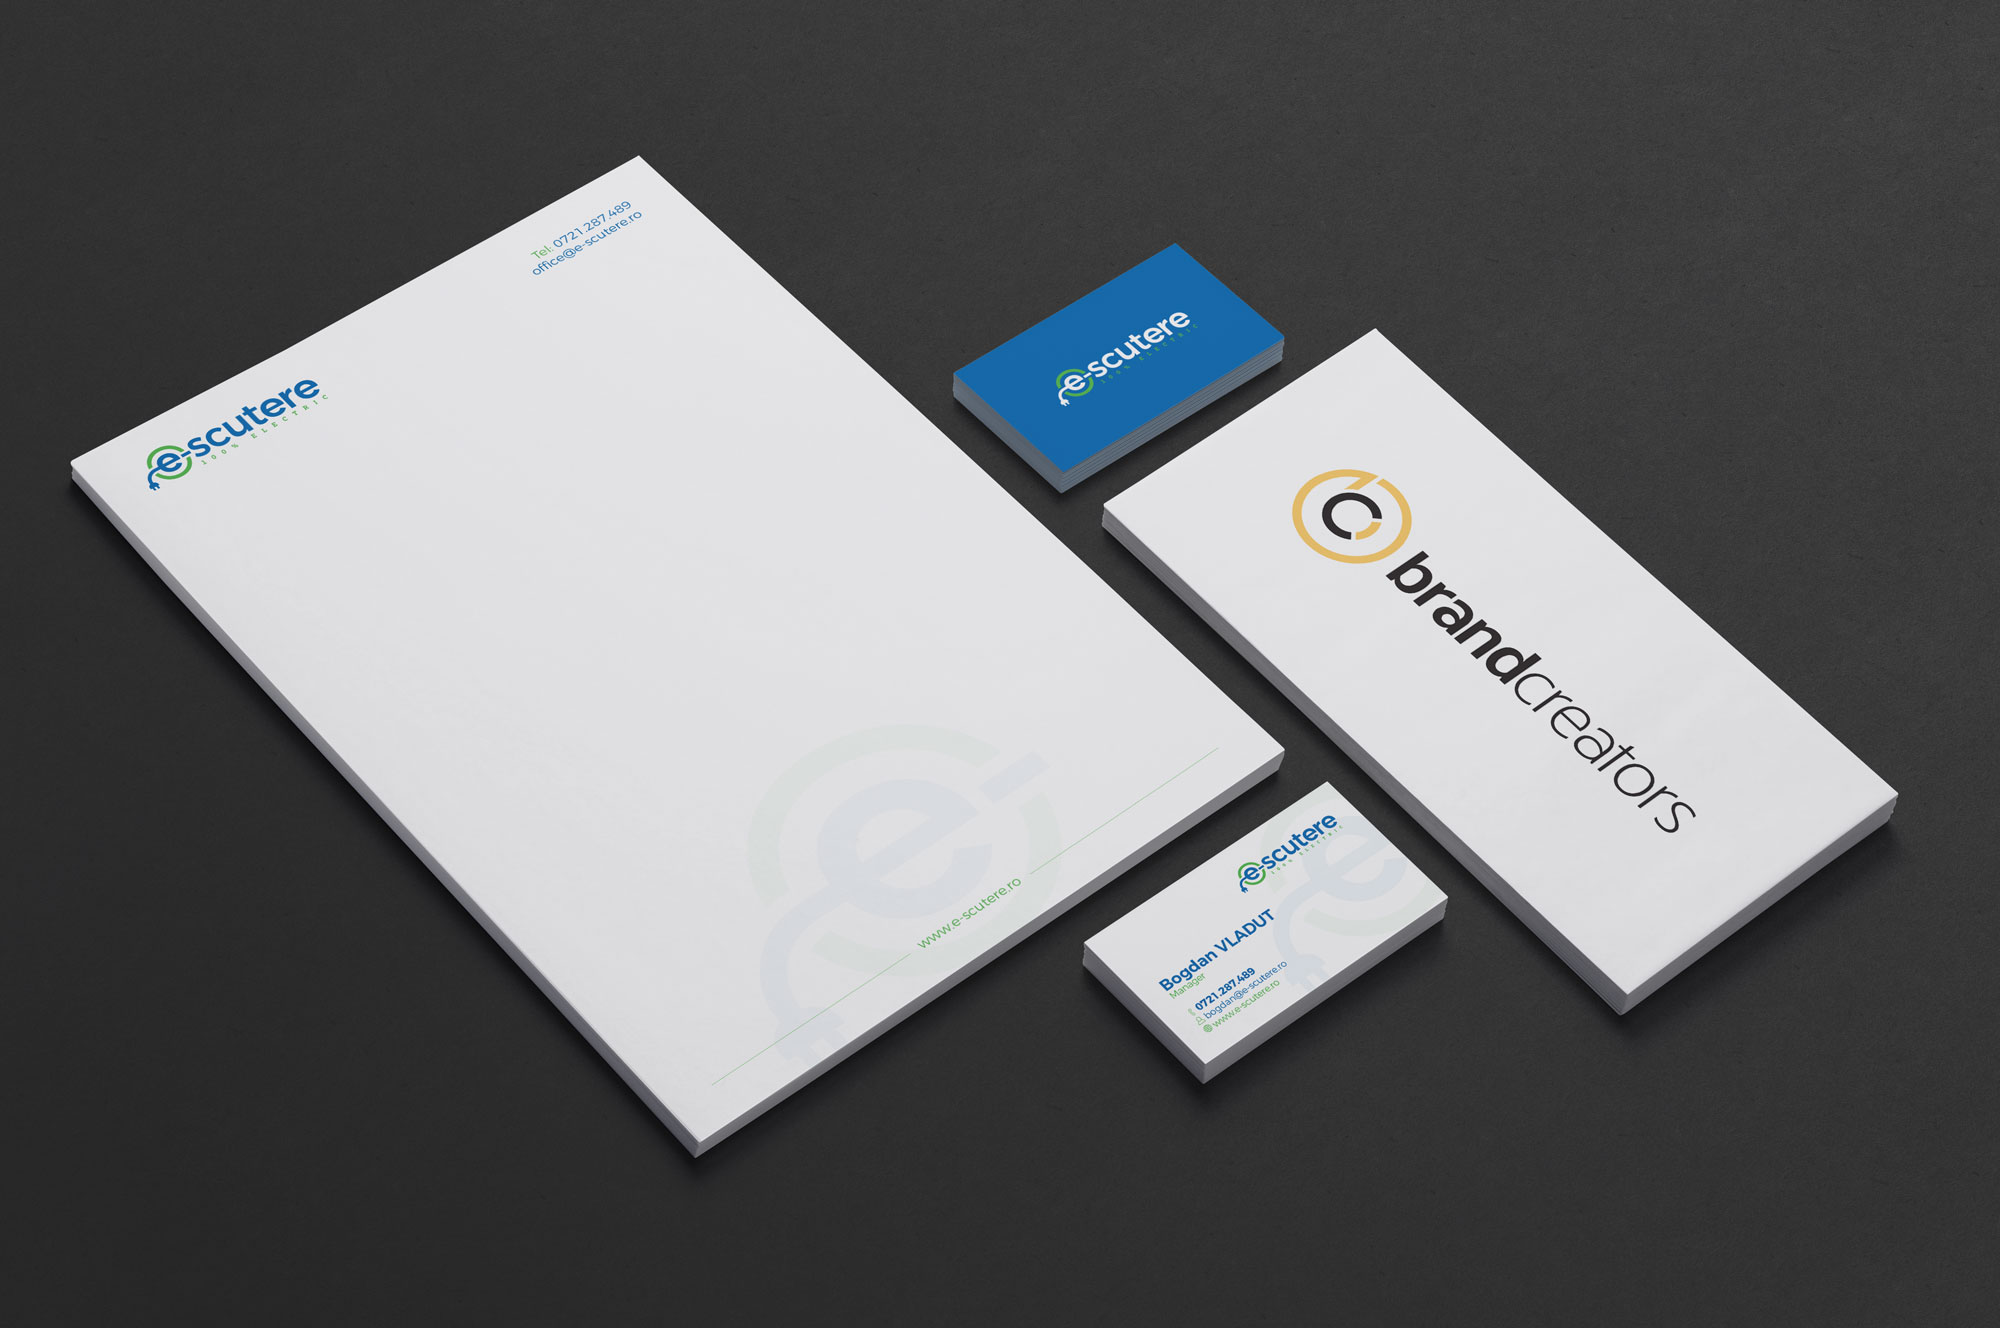 design-carti-vizita-foaie-antet-e-scutere-brandcreators